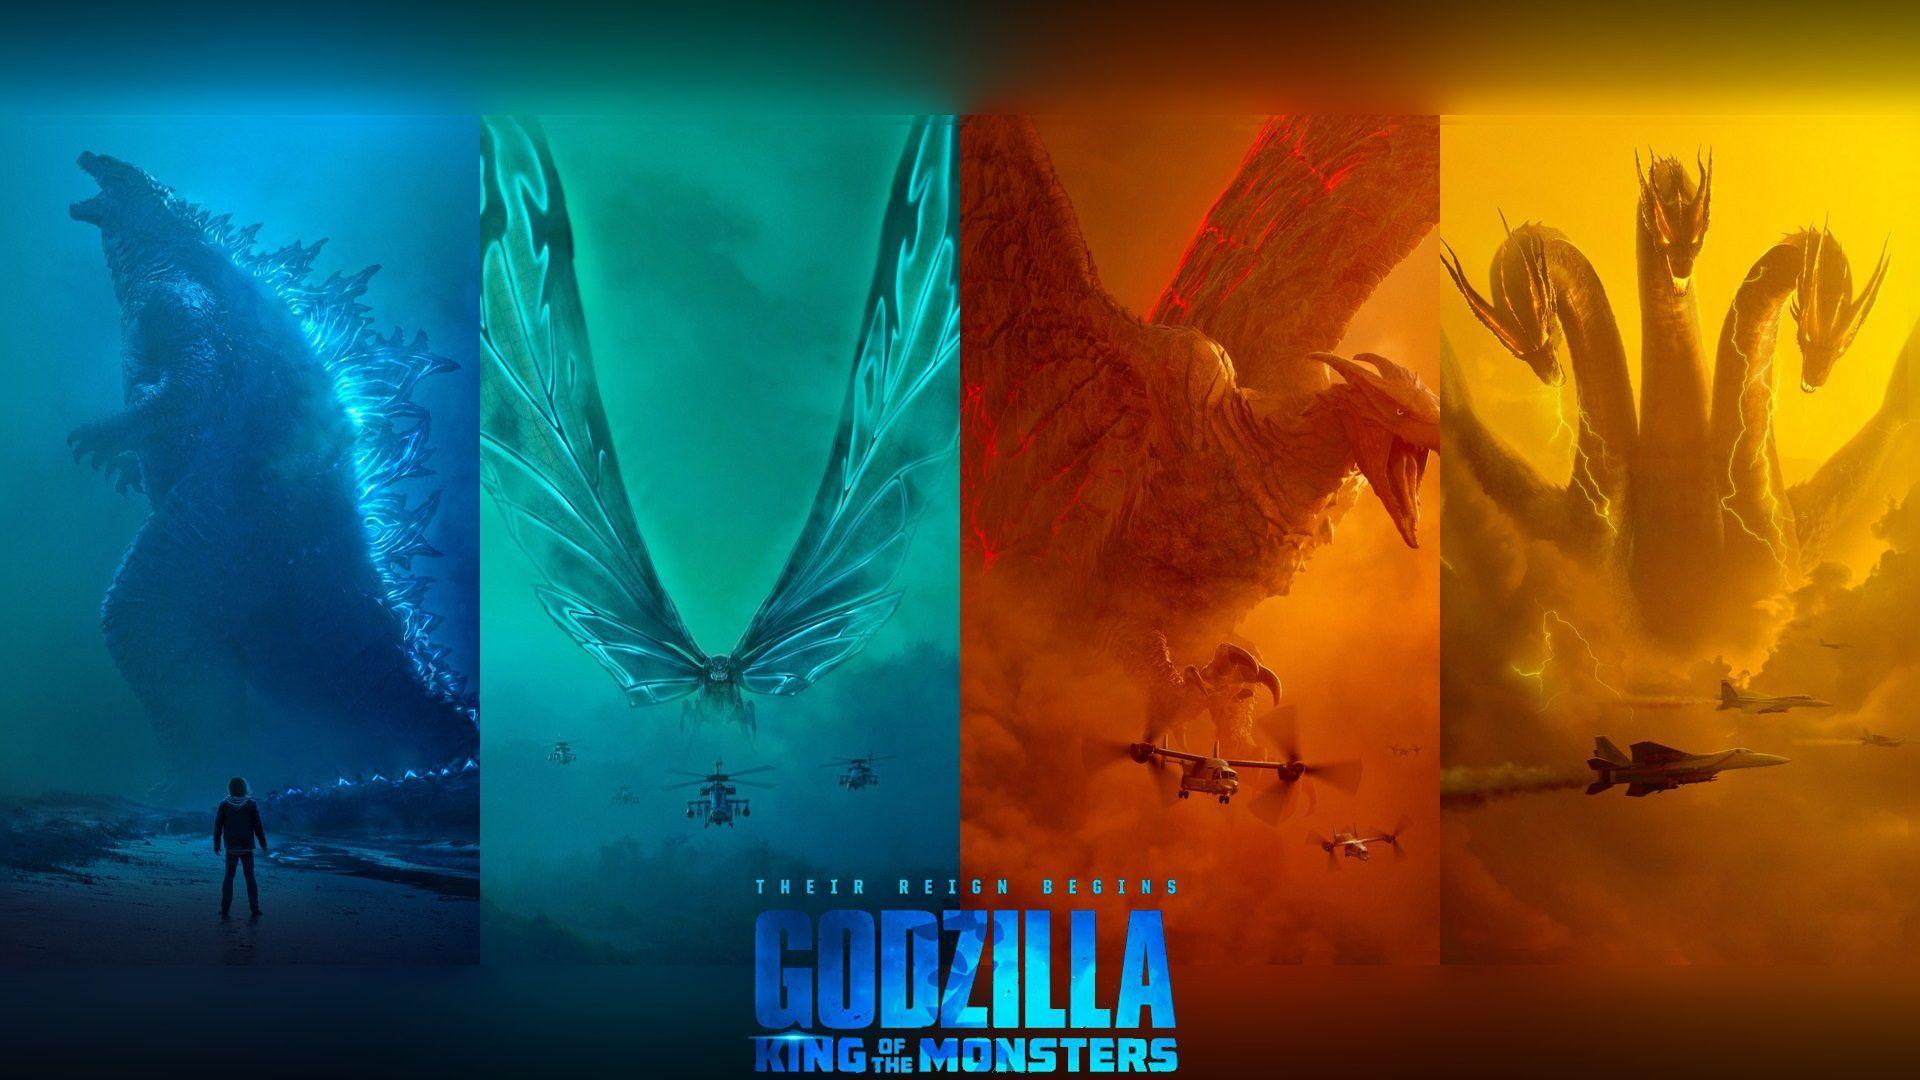 Godzilla King Of Monsters Wallpapers   Top Free Godzilla King Of ...